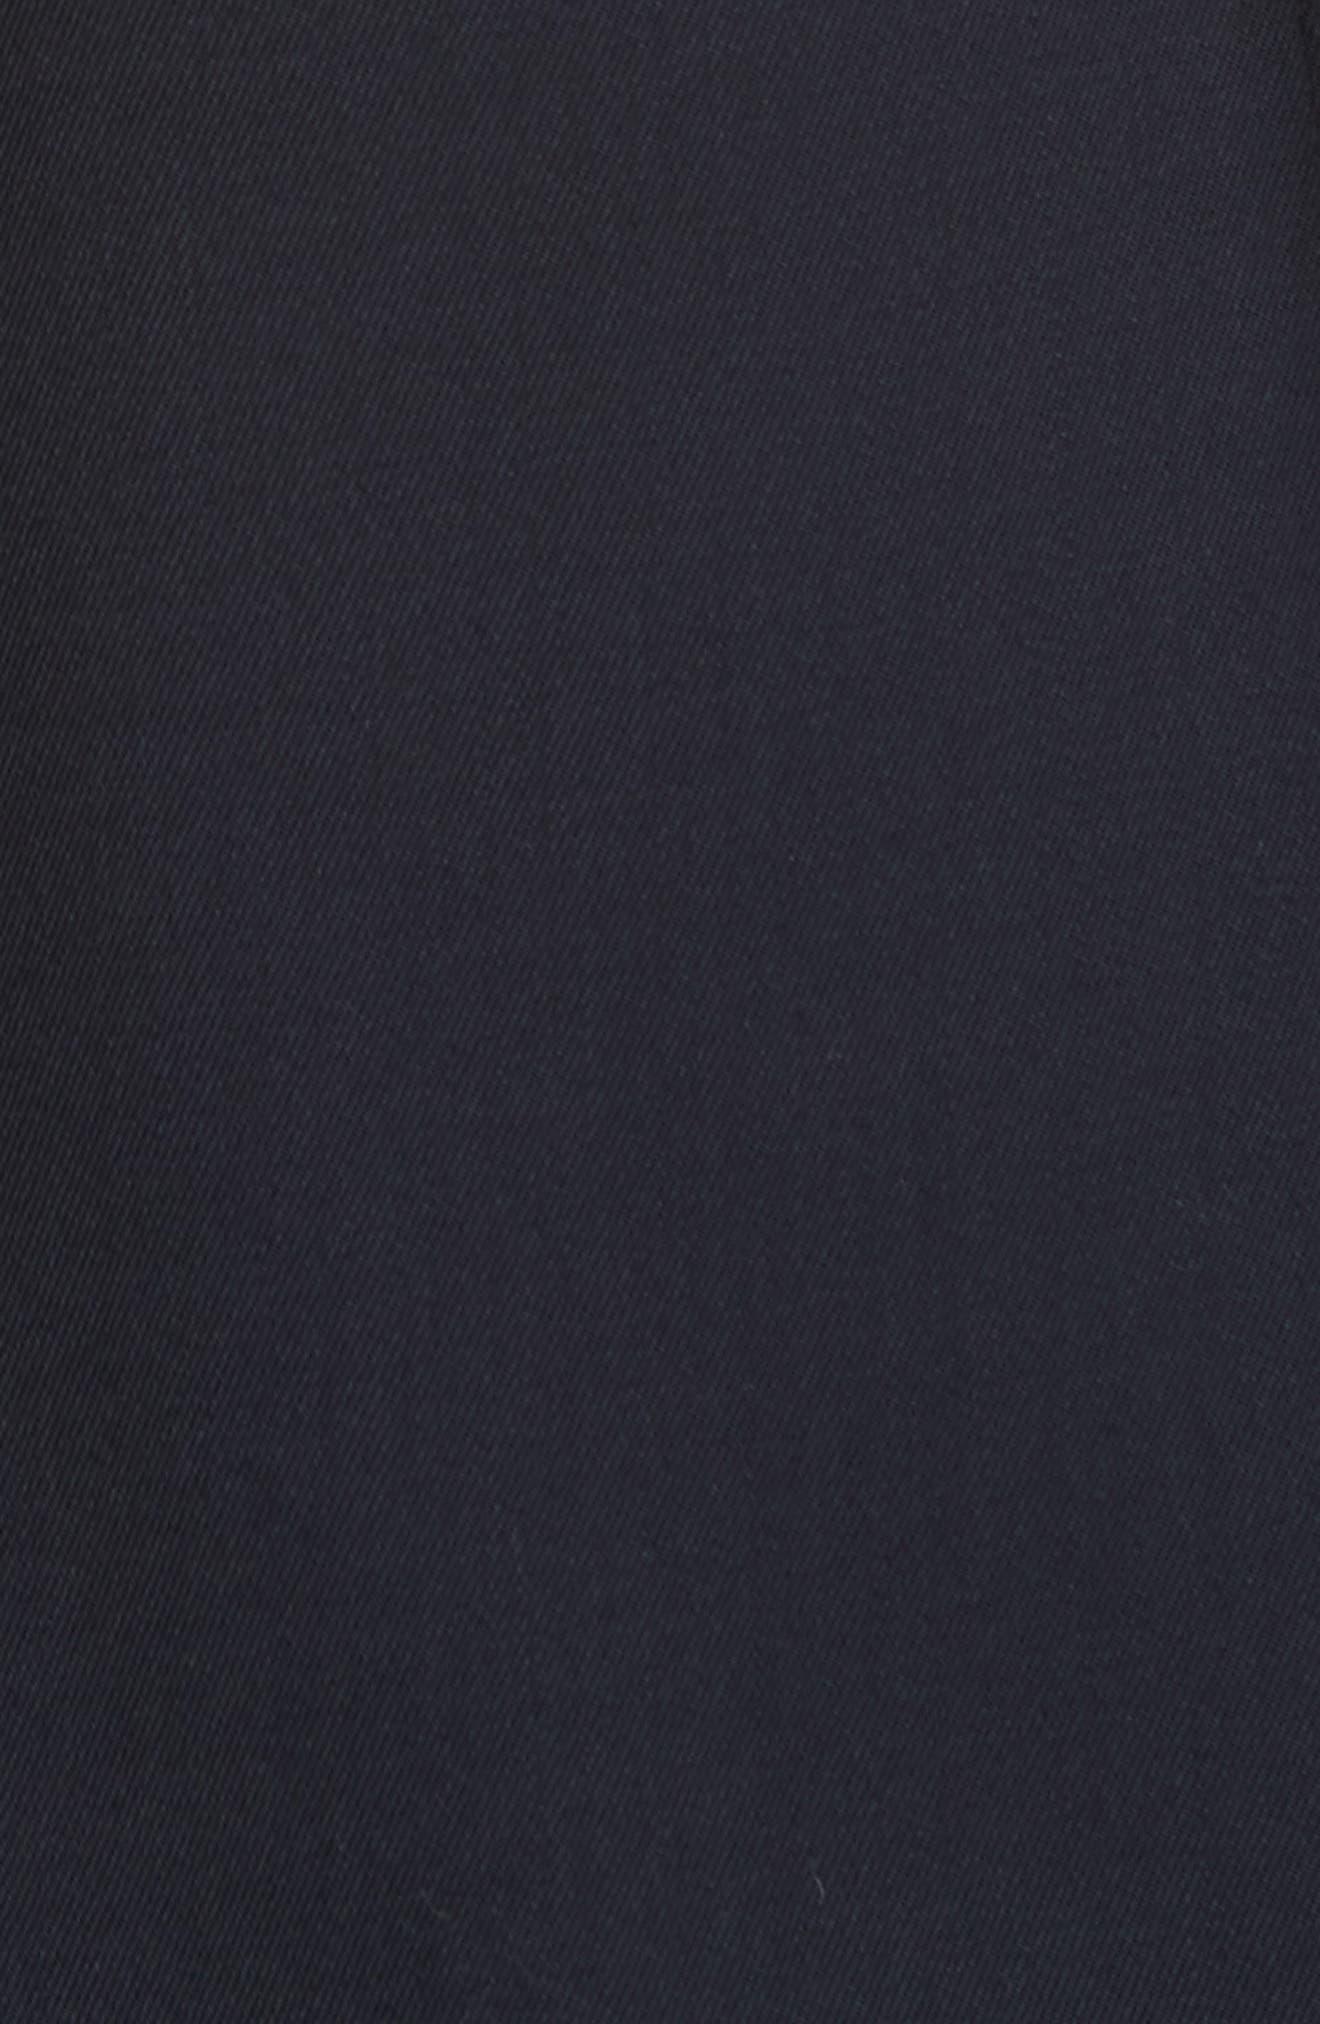 Ruffle Trim Jacket,                             Alternate thumbnail 11, color,